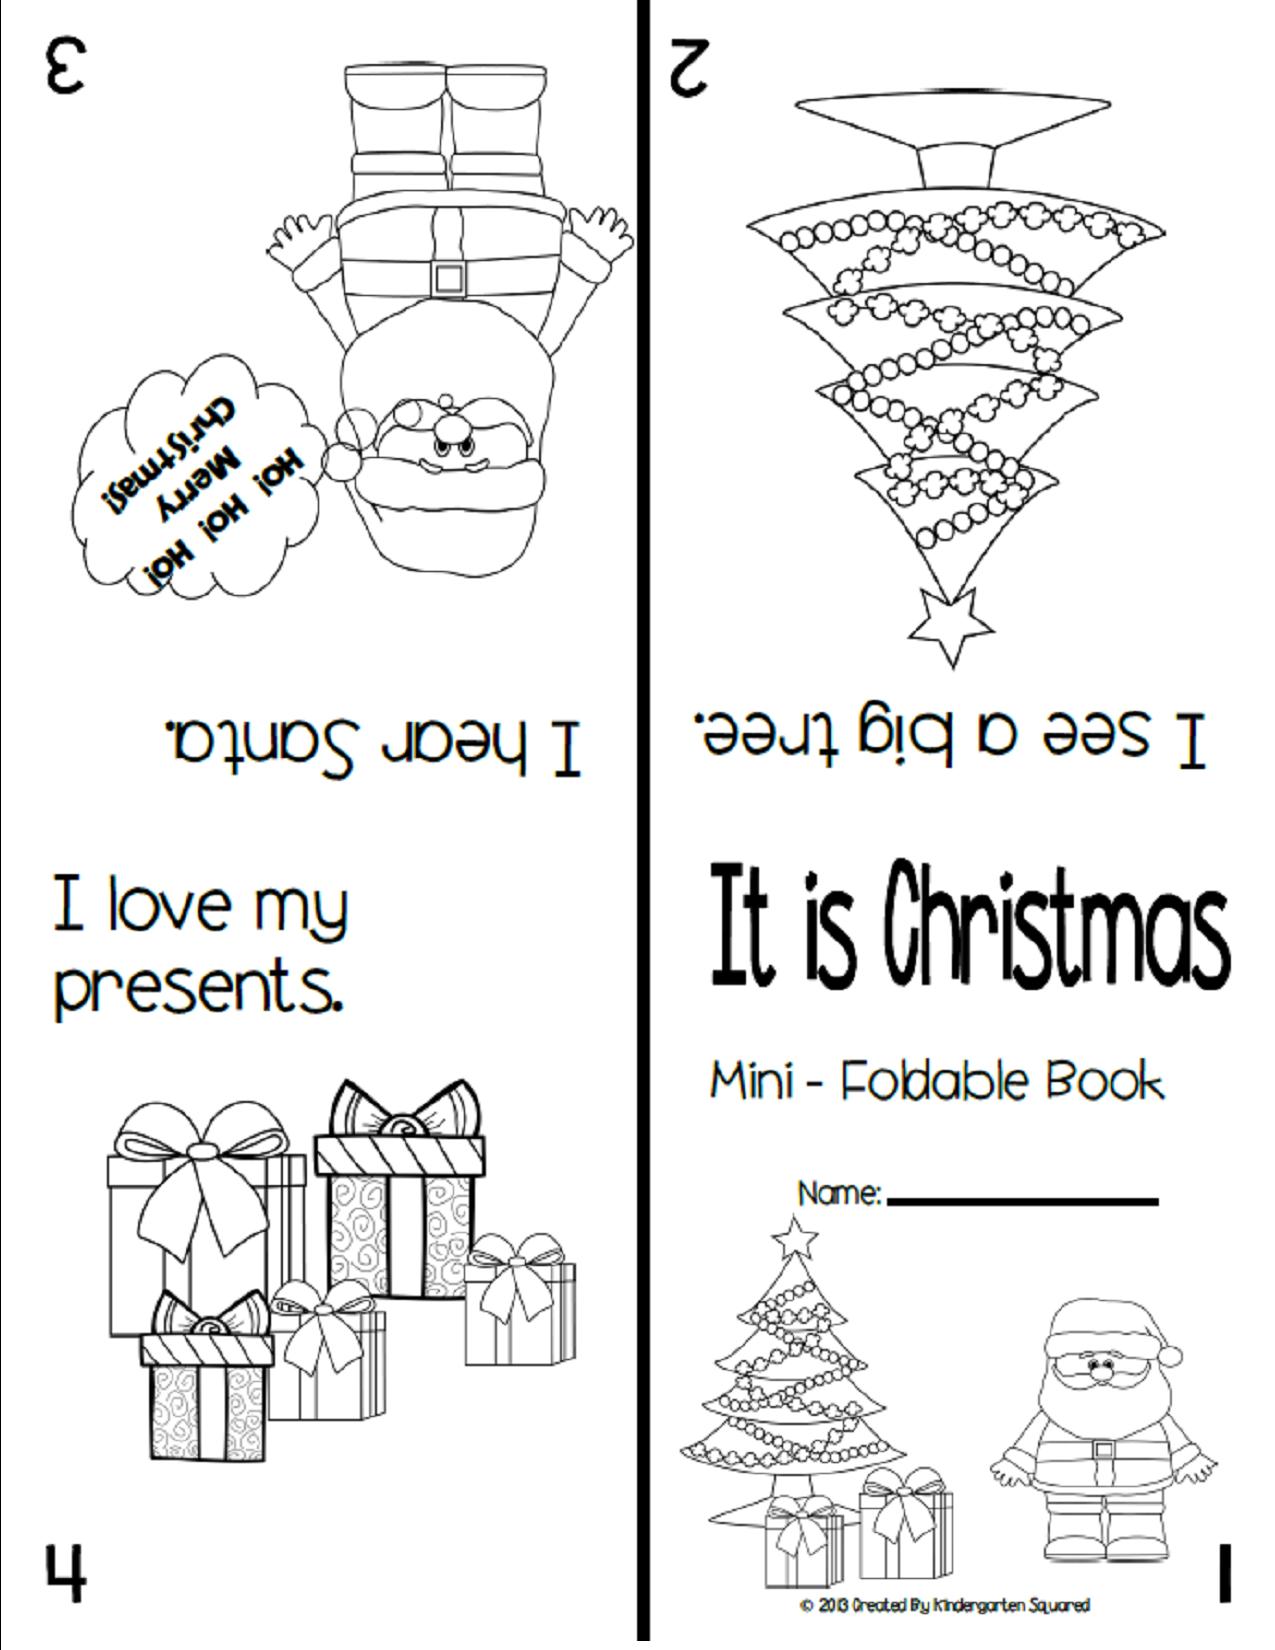 Christmas Chanukah And Kwanzaa Literacy Activities And